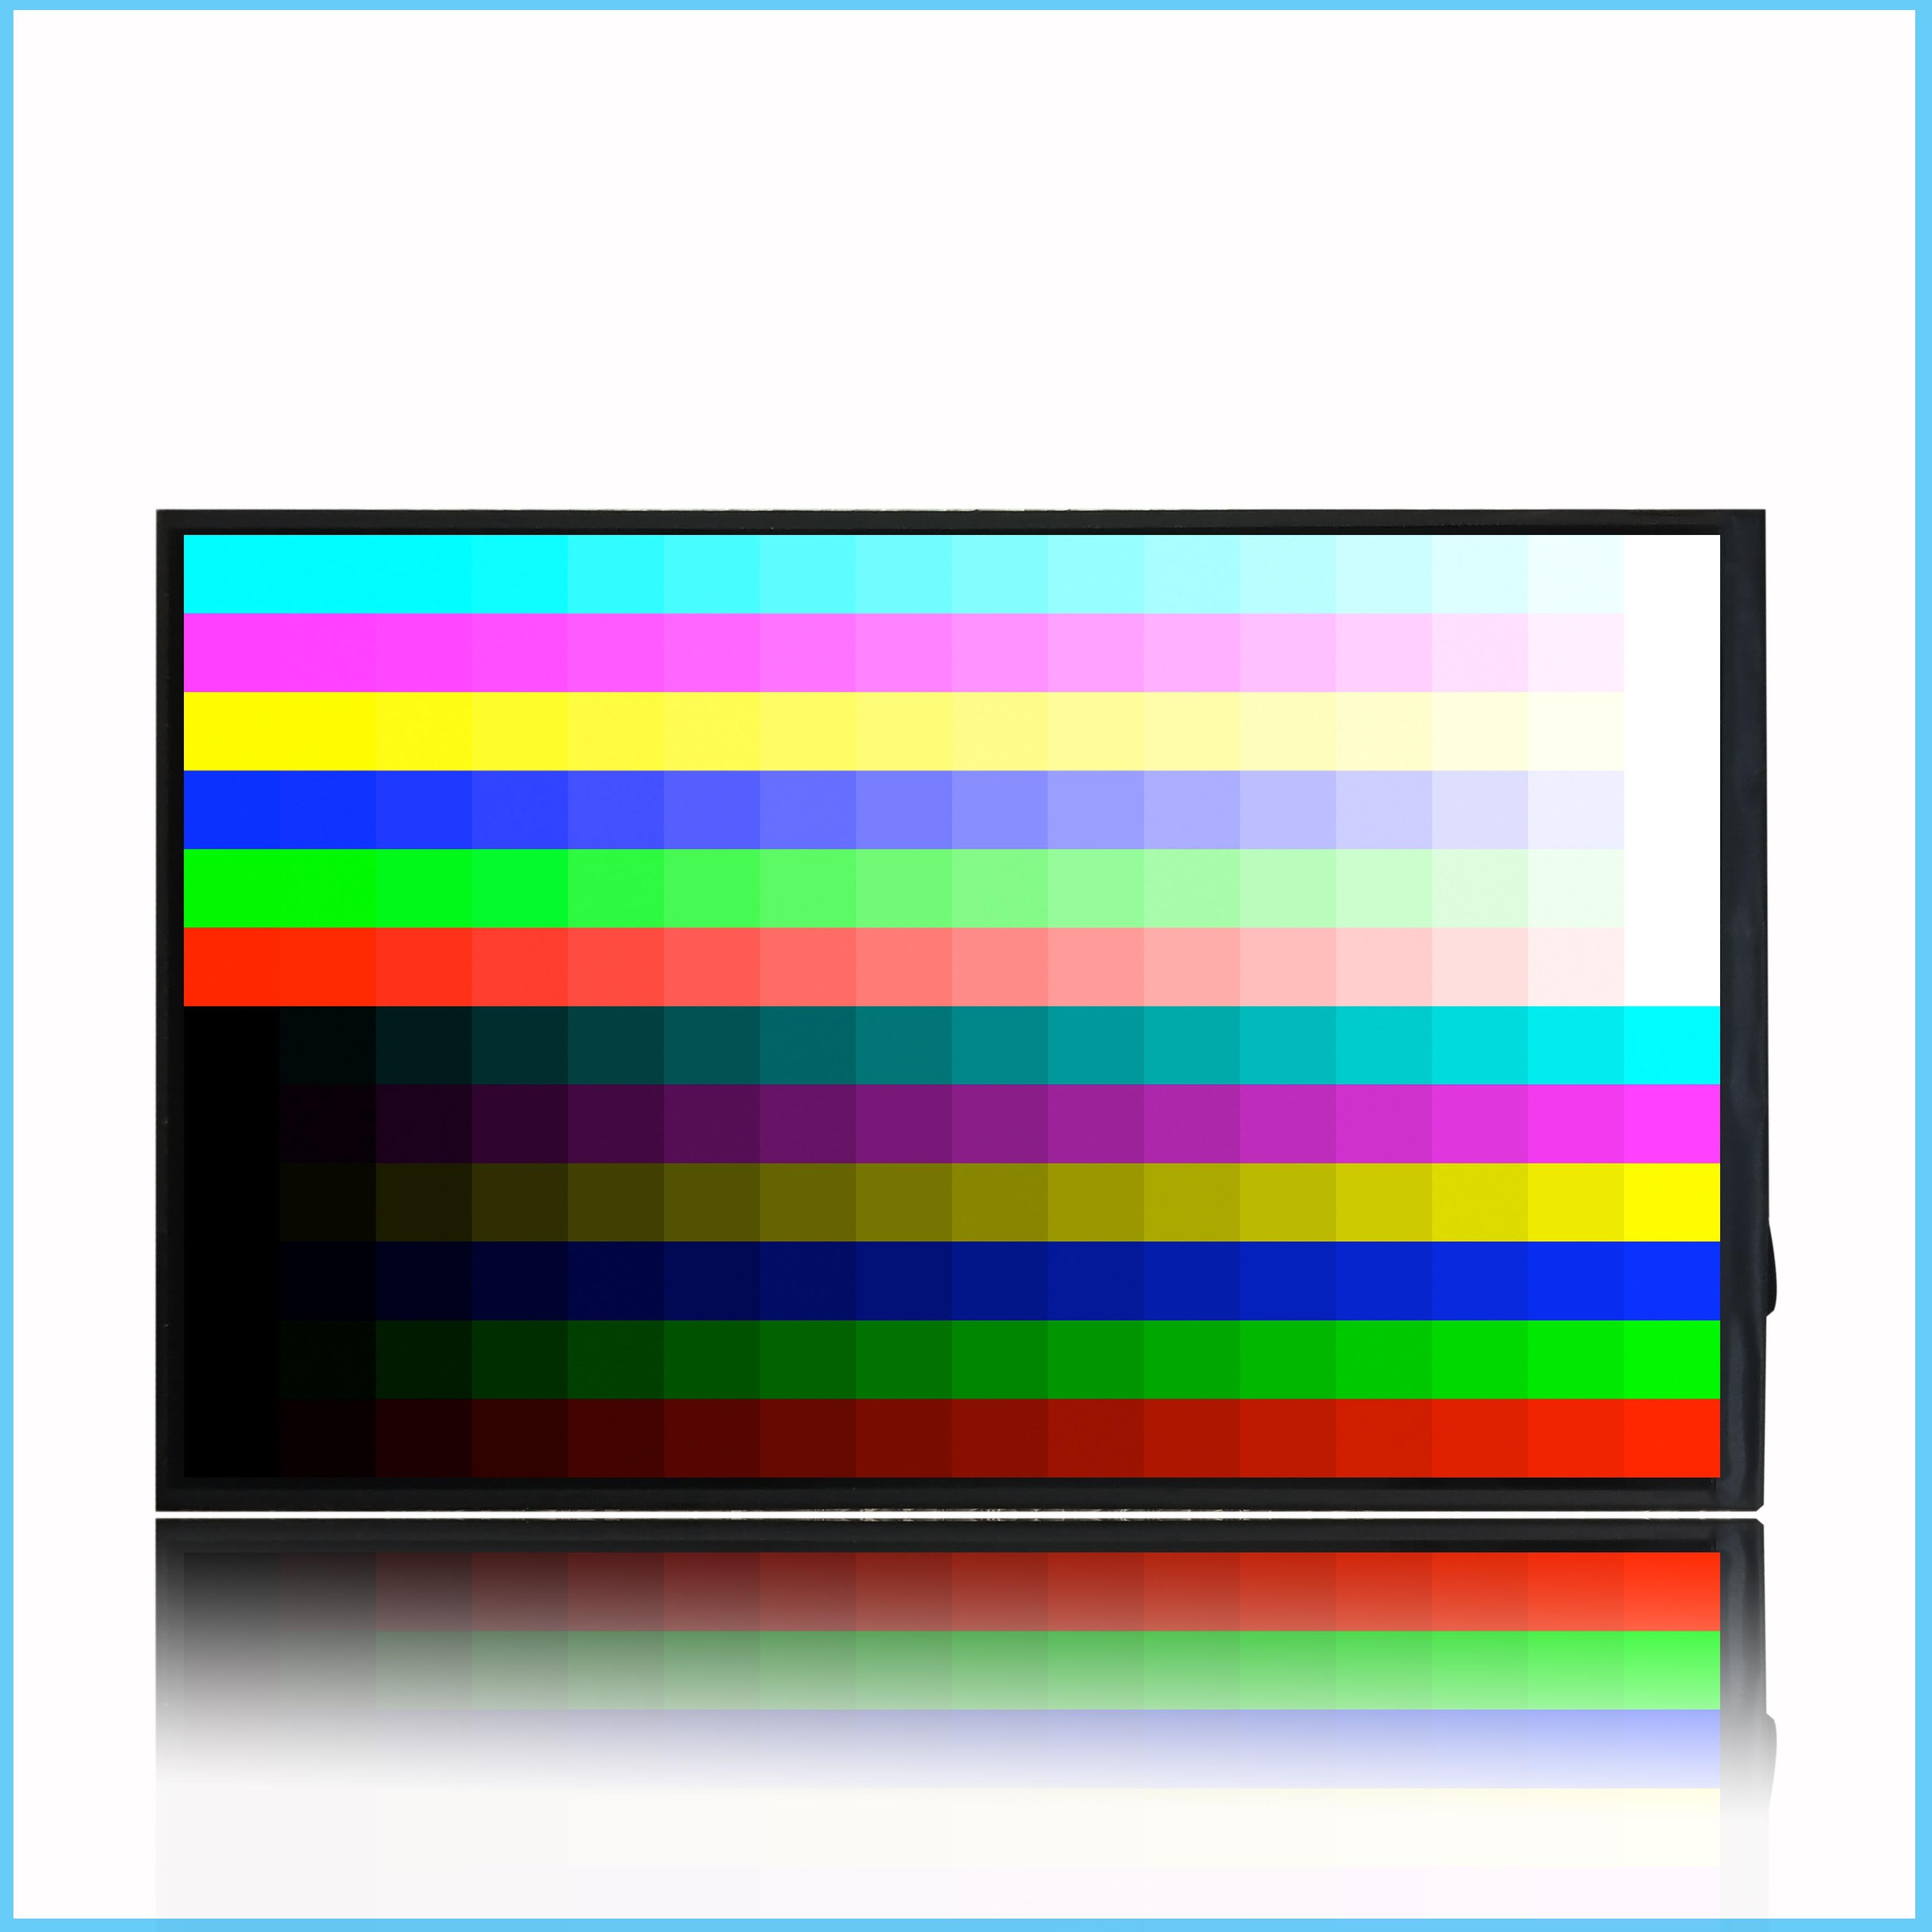 Nuevo 10,1 pulgadas para k101-02m401-fpc-b k101-im20a805-l k101-im2qa805-l pantalla lcd interna panel Replacement